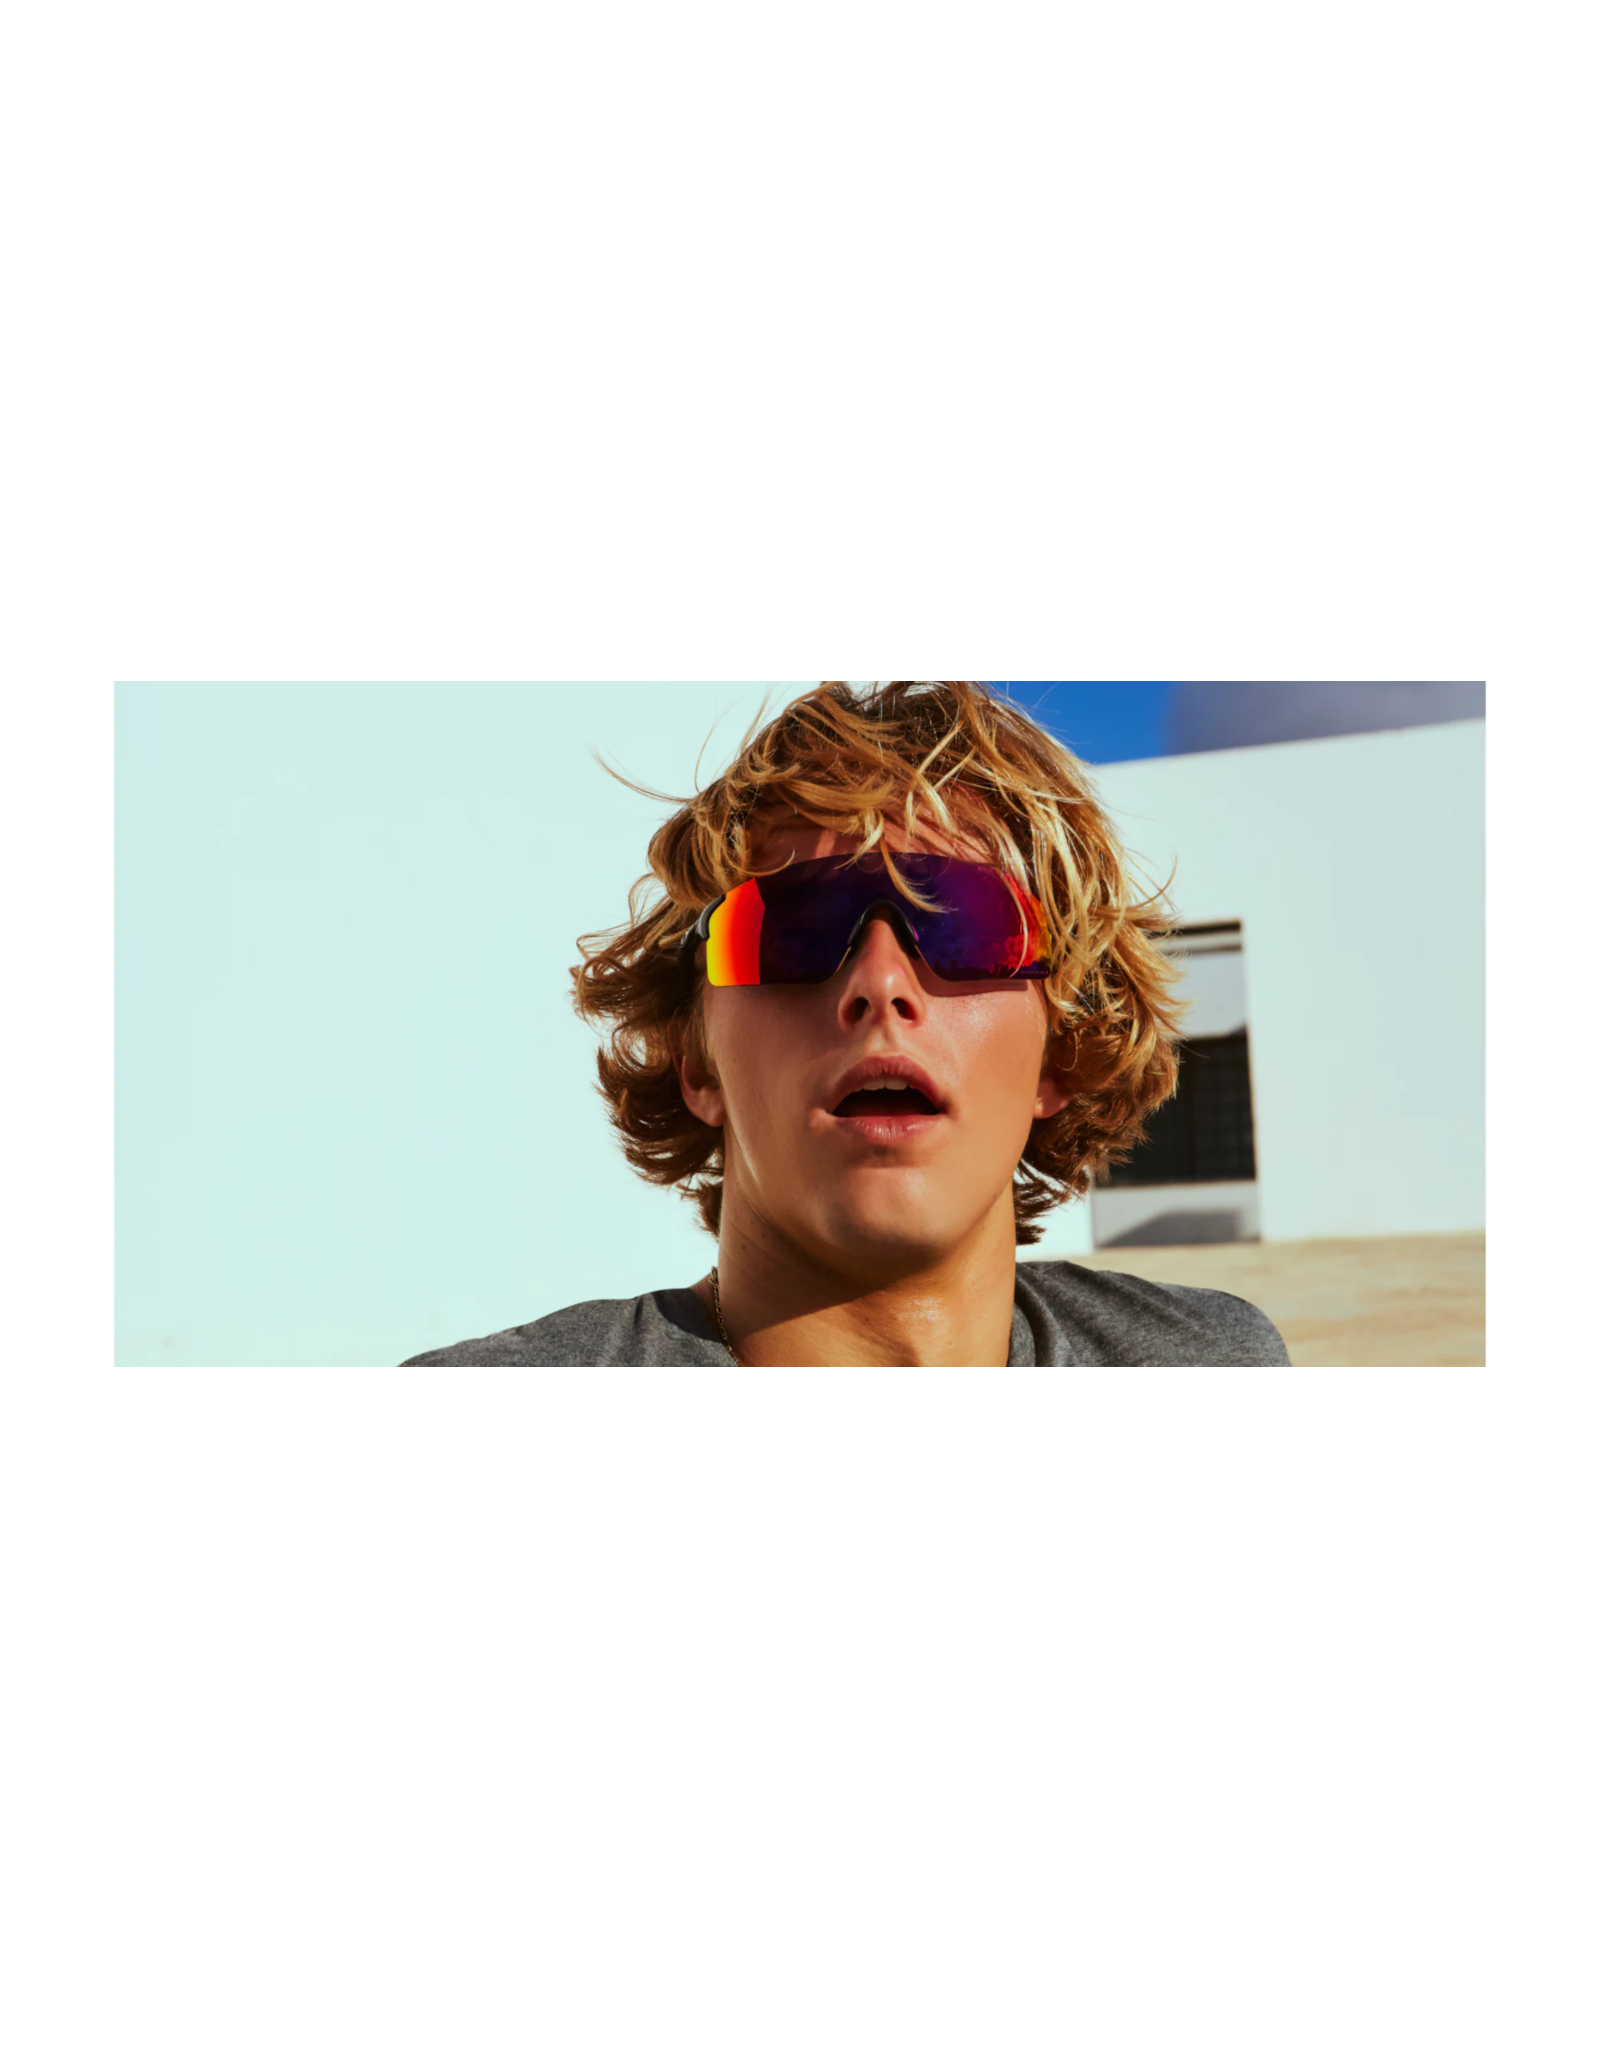 OAKLEY Oakley EVZero Blades (A) polished noir w prizm road sunglasses